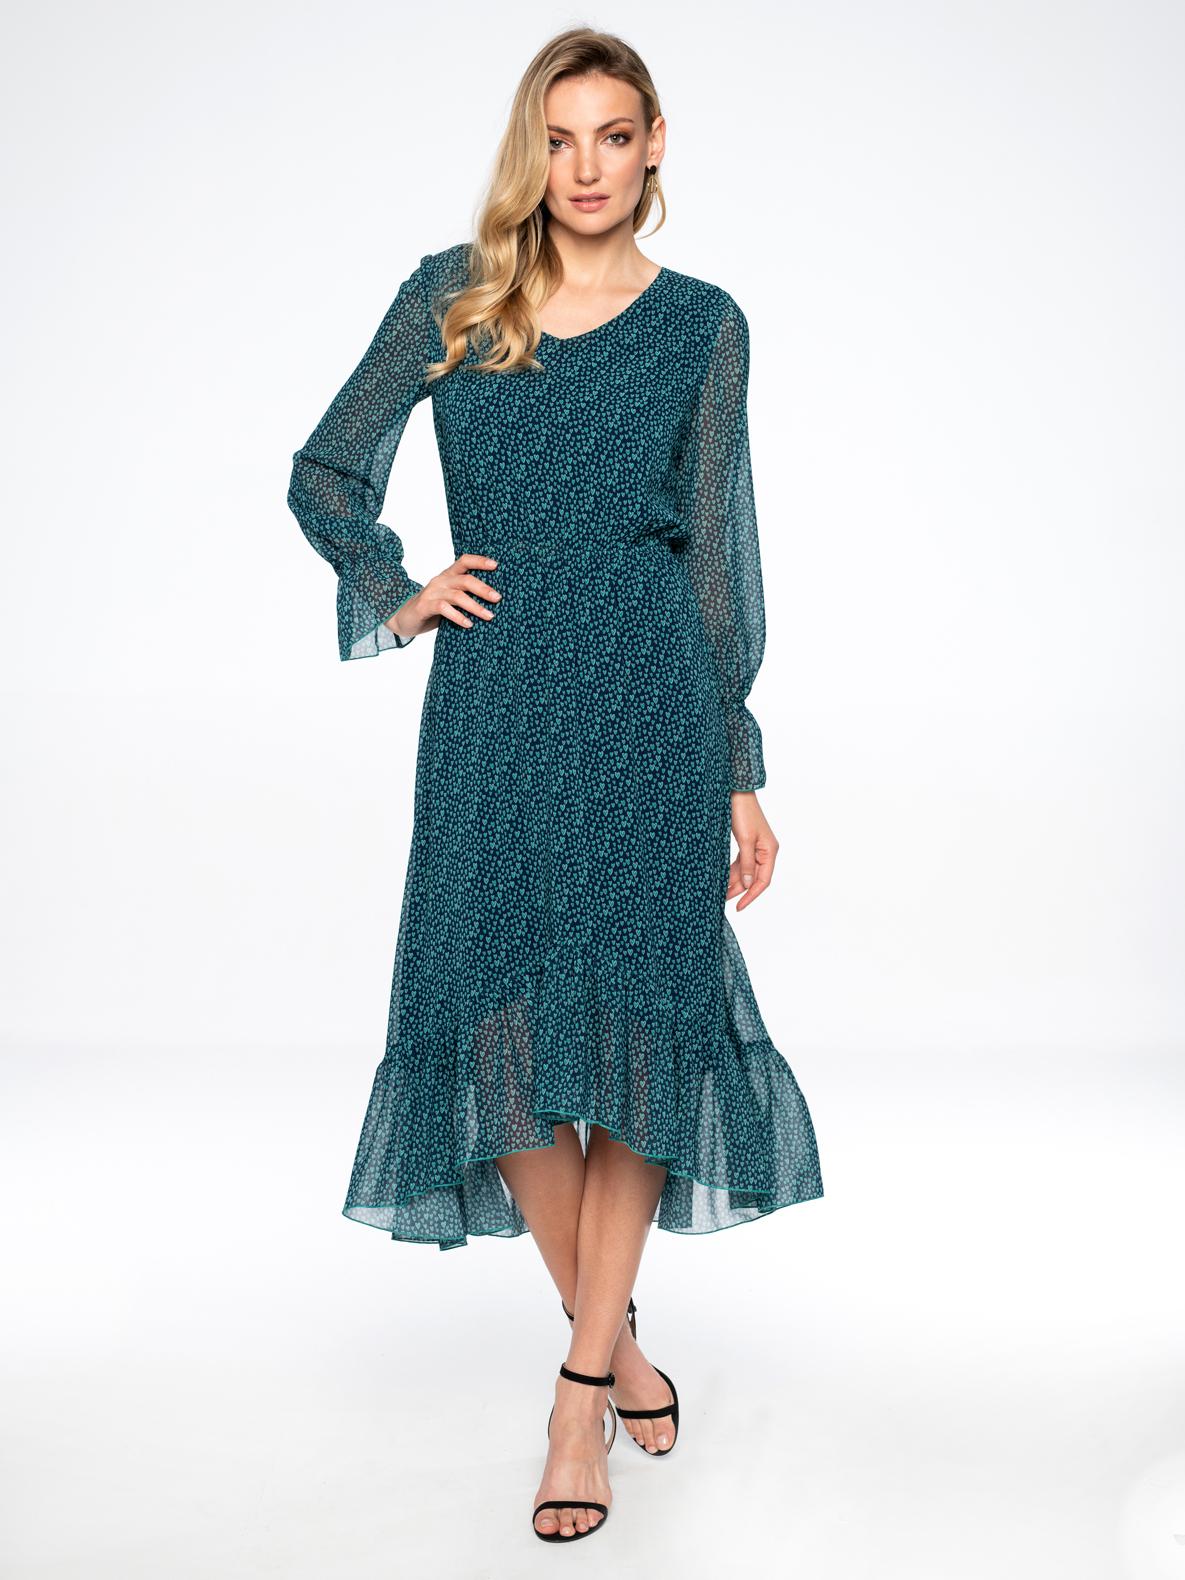 Dress Magnolia